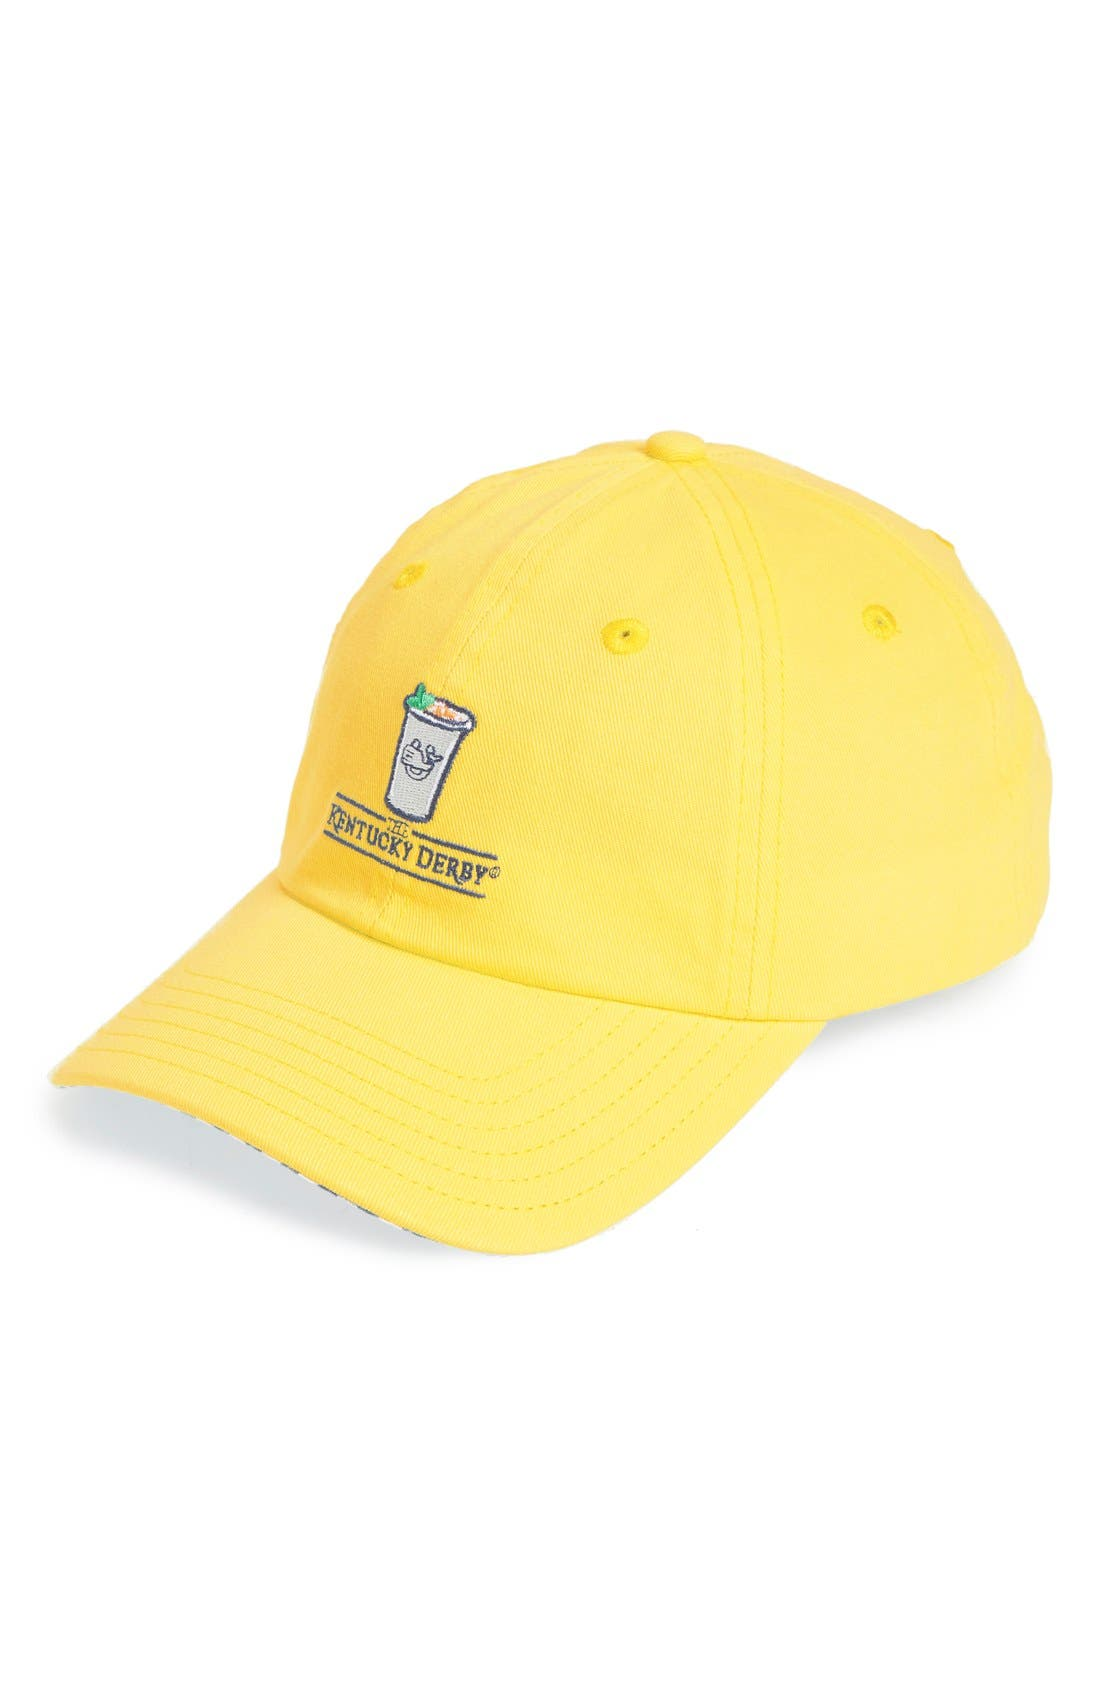 Main Image - Vineyard Vines 'Mint Julep' Baseball Cap